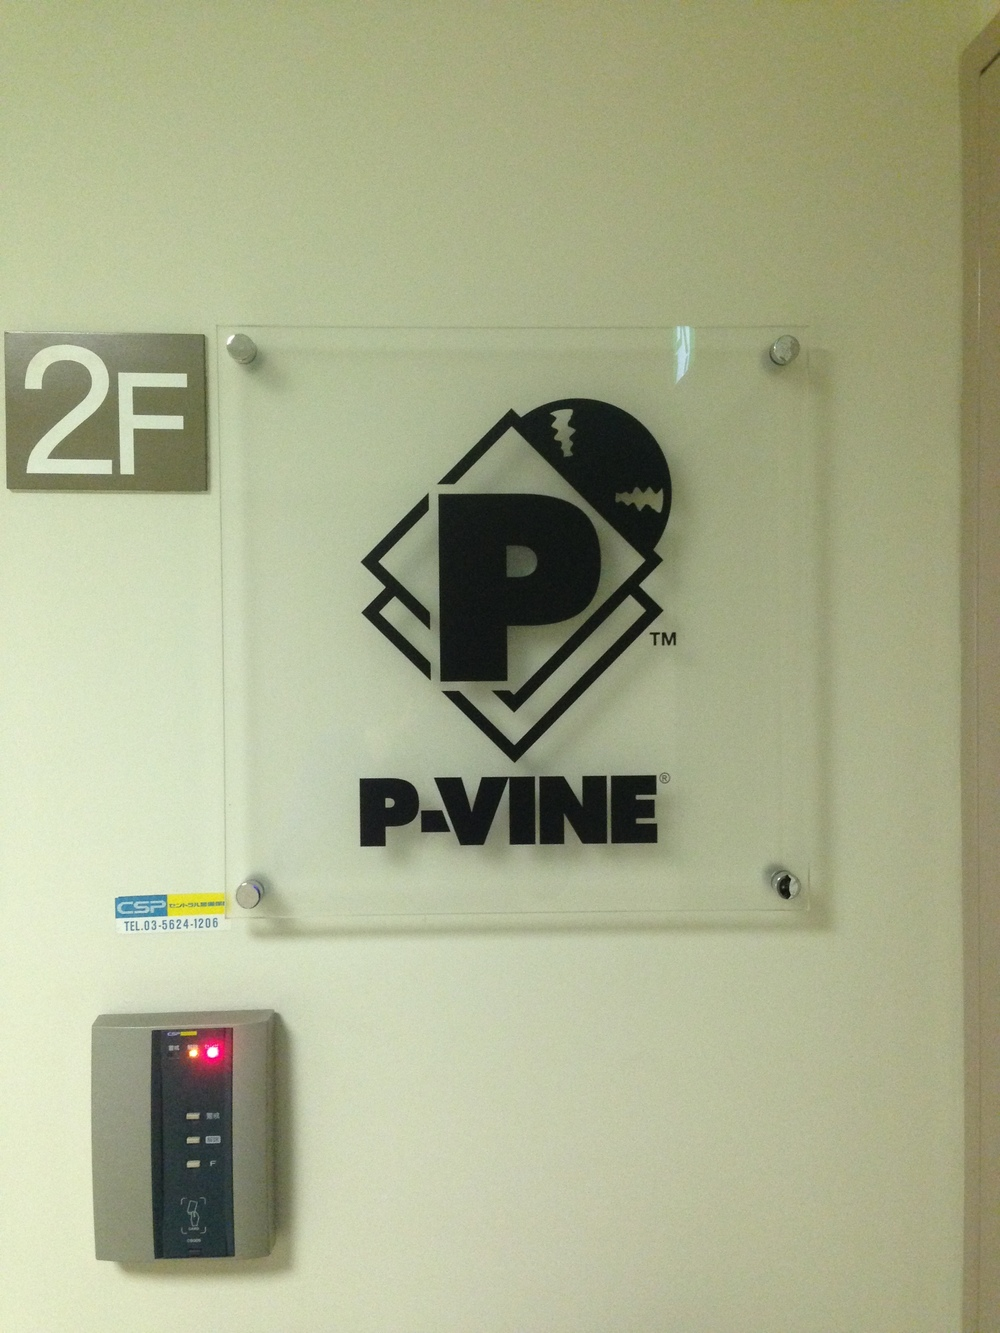 P-Vine Sign.jpg